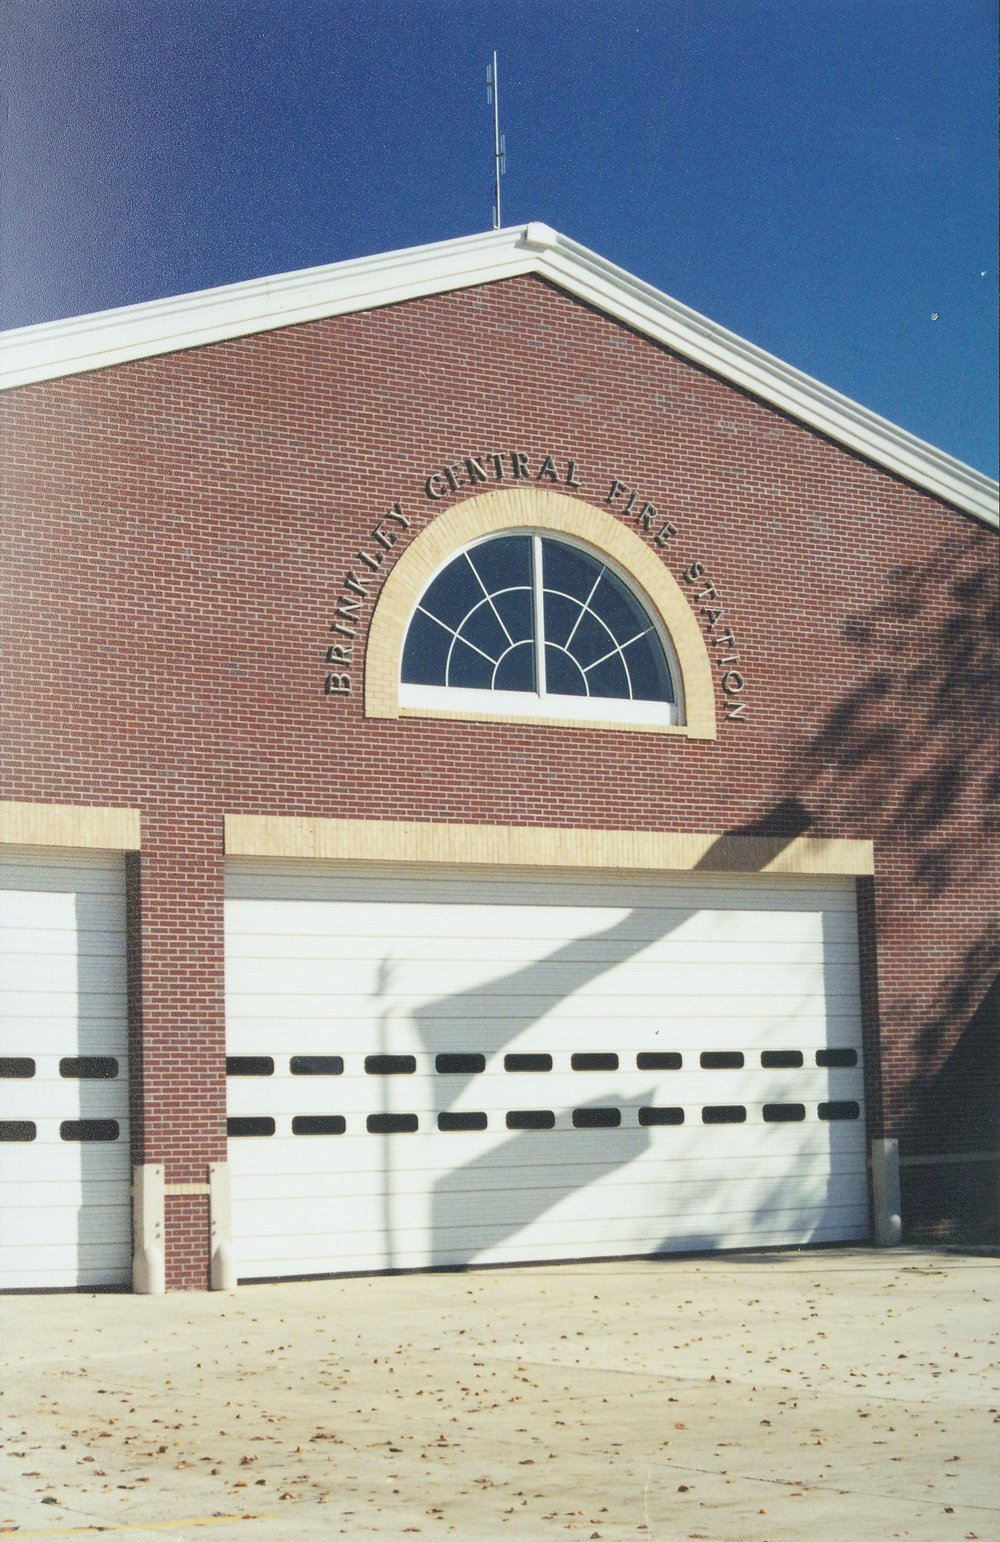 Brinkley Fire Station